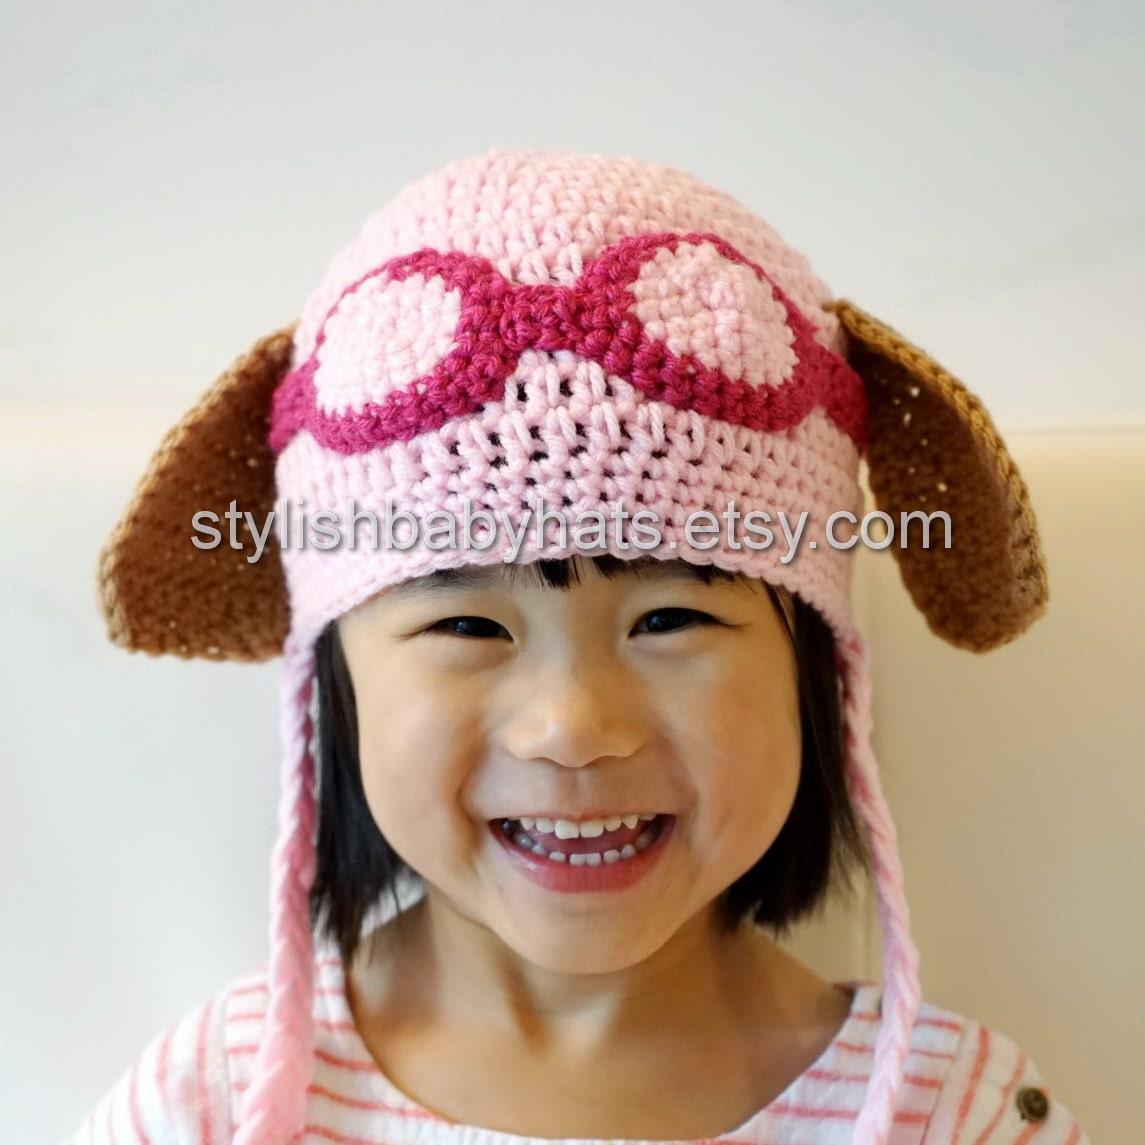 Crochet Hat Pattern Paw Patrol : Skye Hat PAW Patrol Hat Crochet Baby Hat Cockapoo Dog Hat